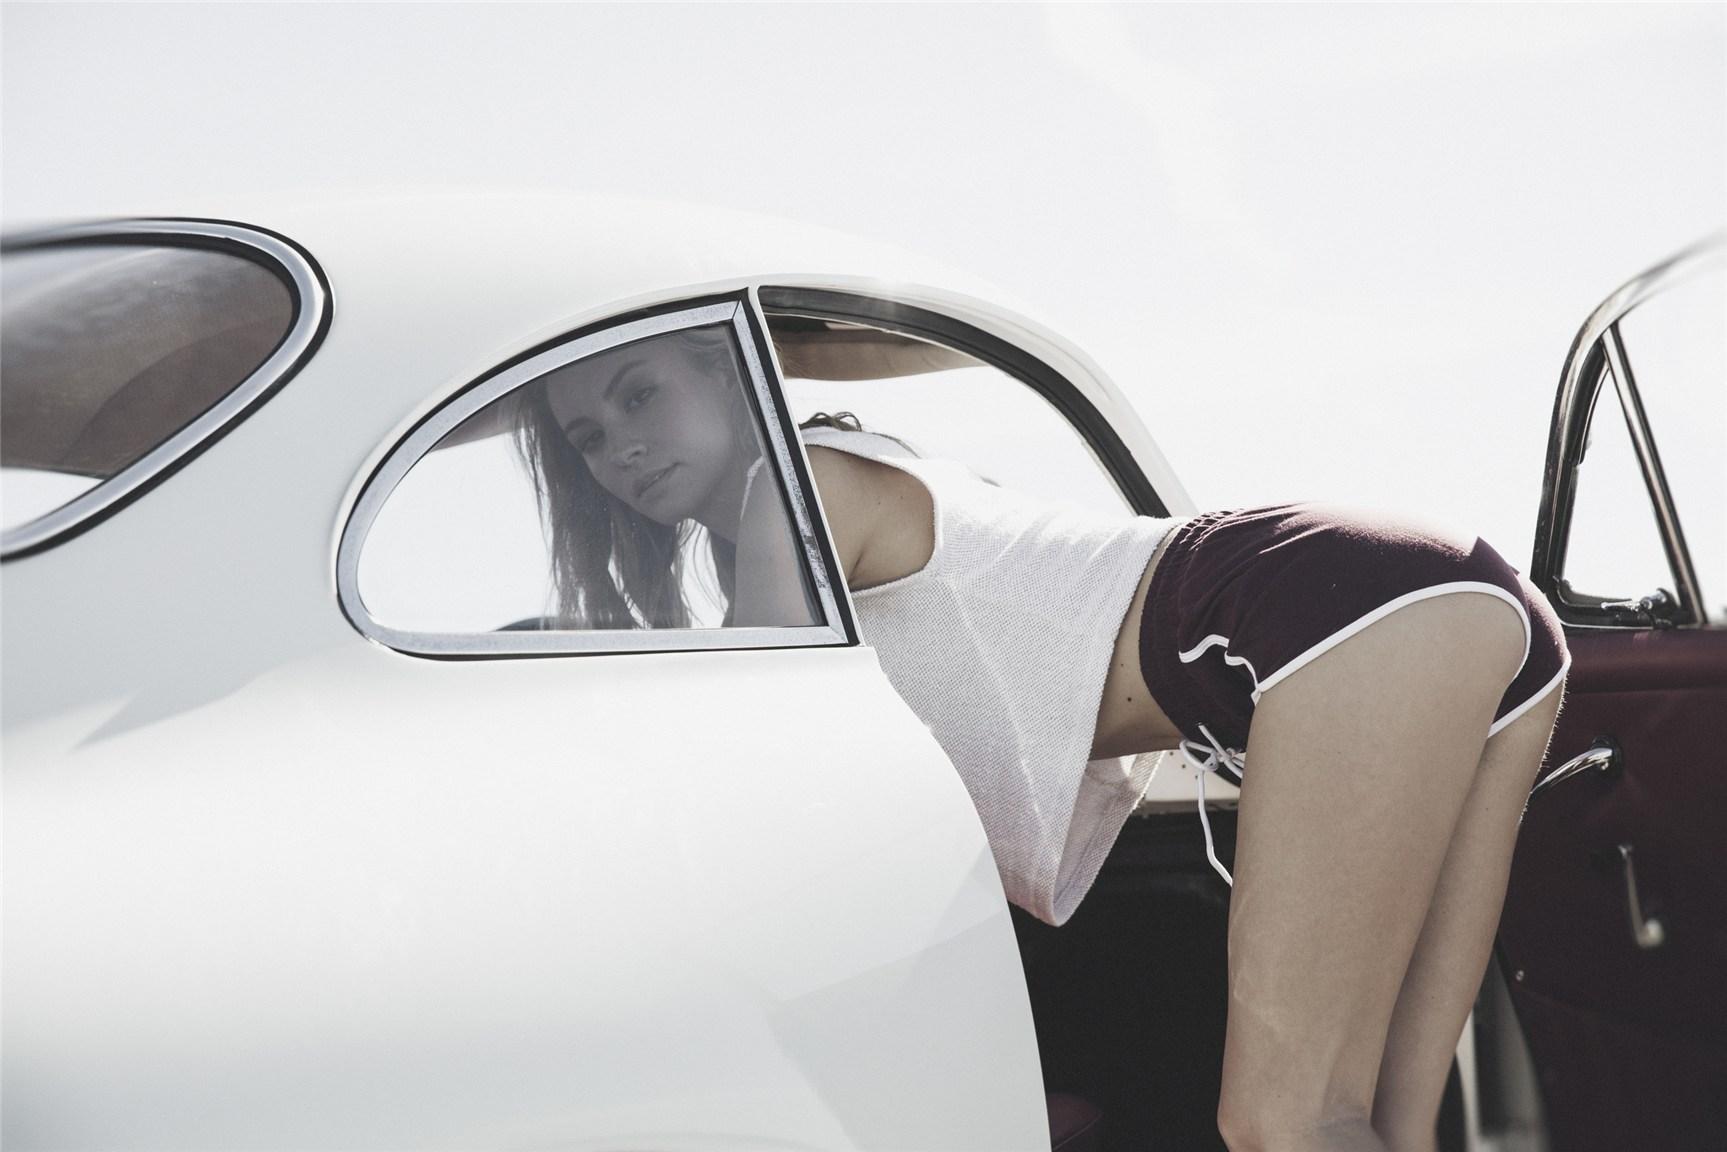 Bryana Holly / Брайана Холли в одежде VNDA Holiday 2015